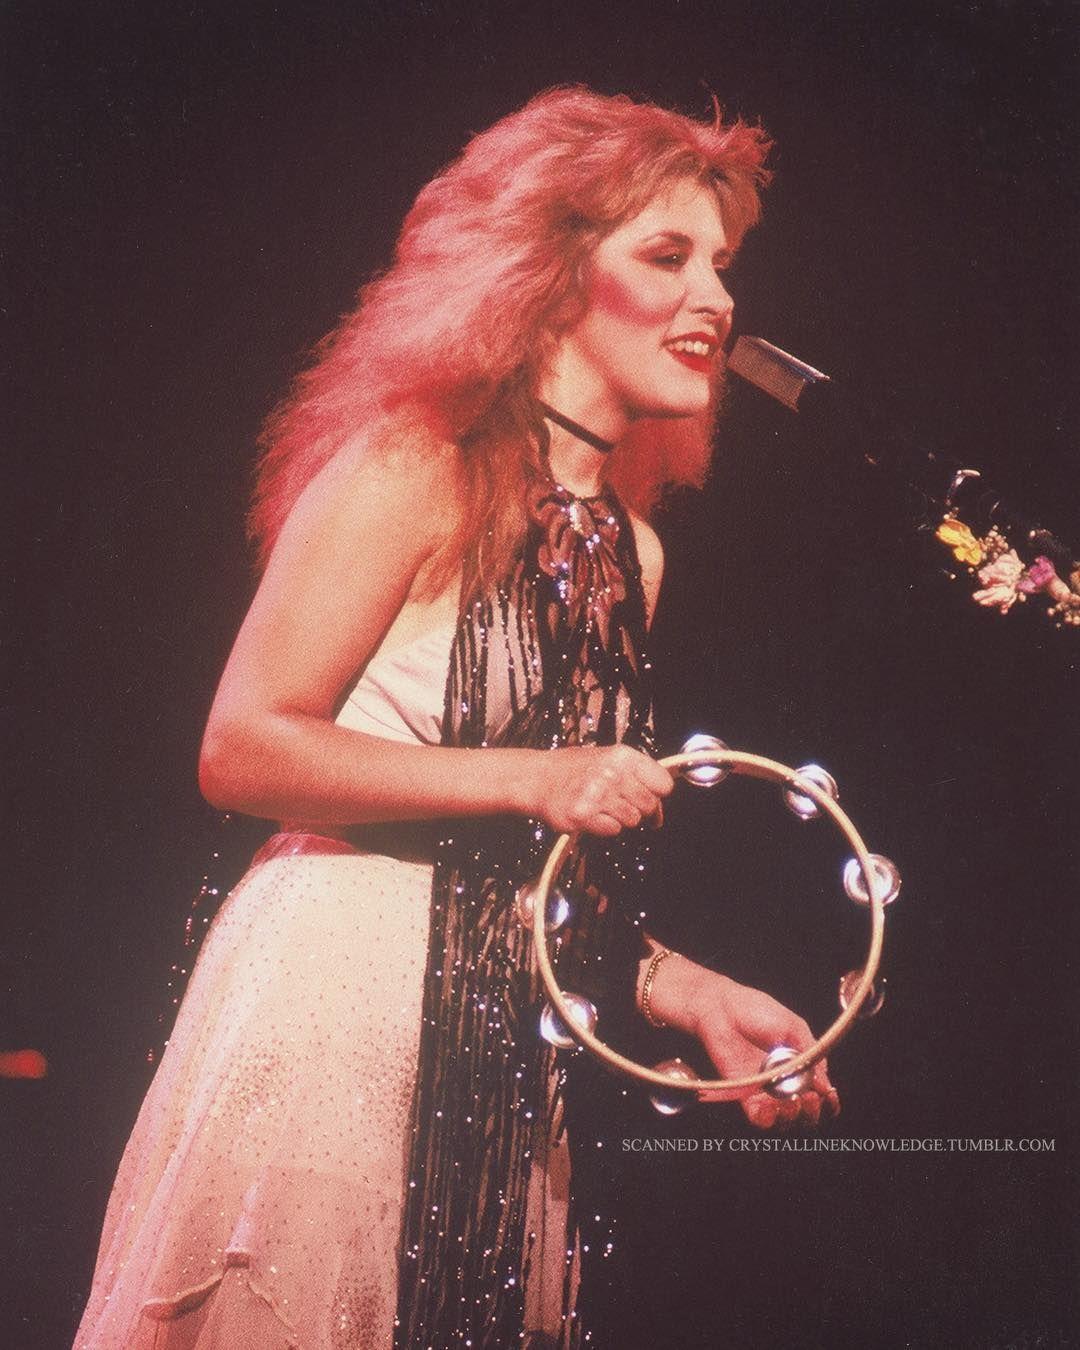 Stevie Nicks Daily On Instagram Mirage Tour Stevie Nicks Stevie Stevie Nicks Fleetwood Mac [ 1350 x 1080 Pixel ]